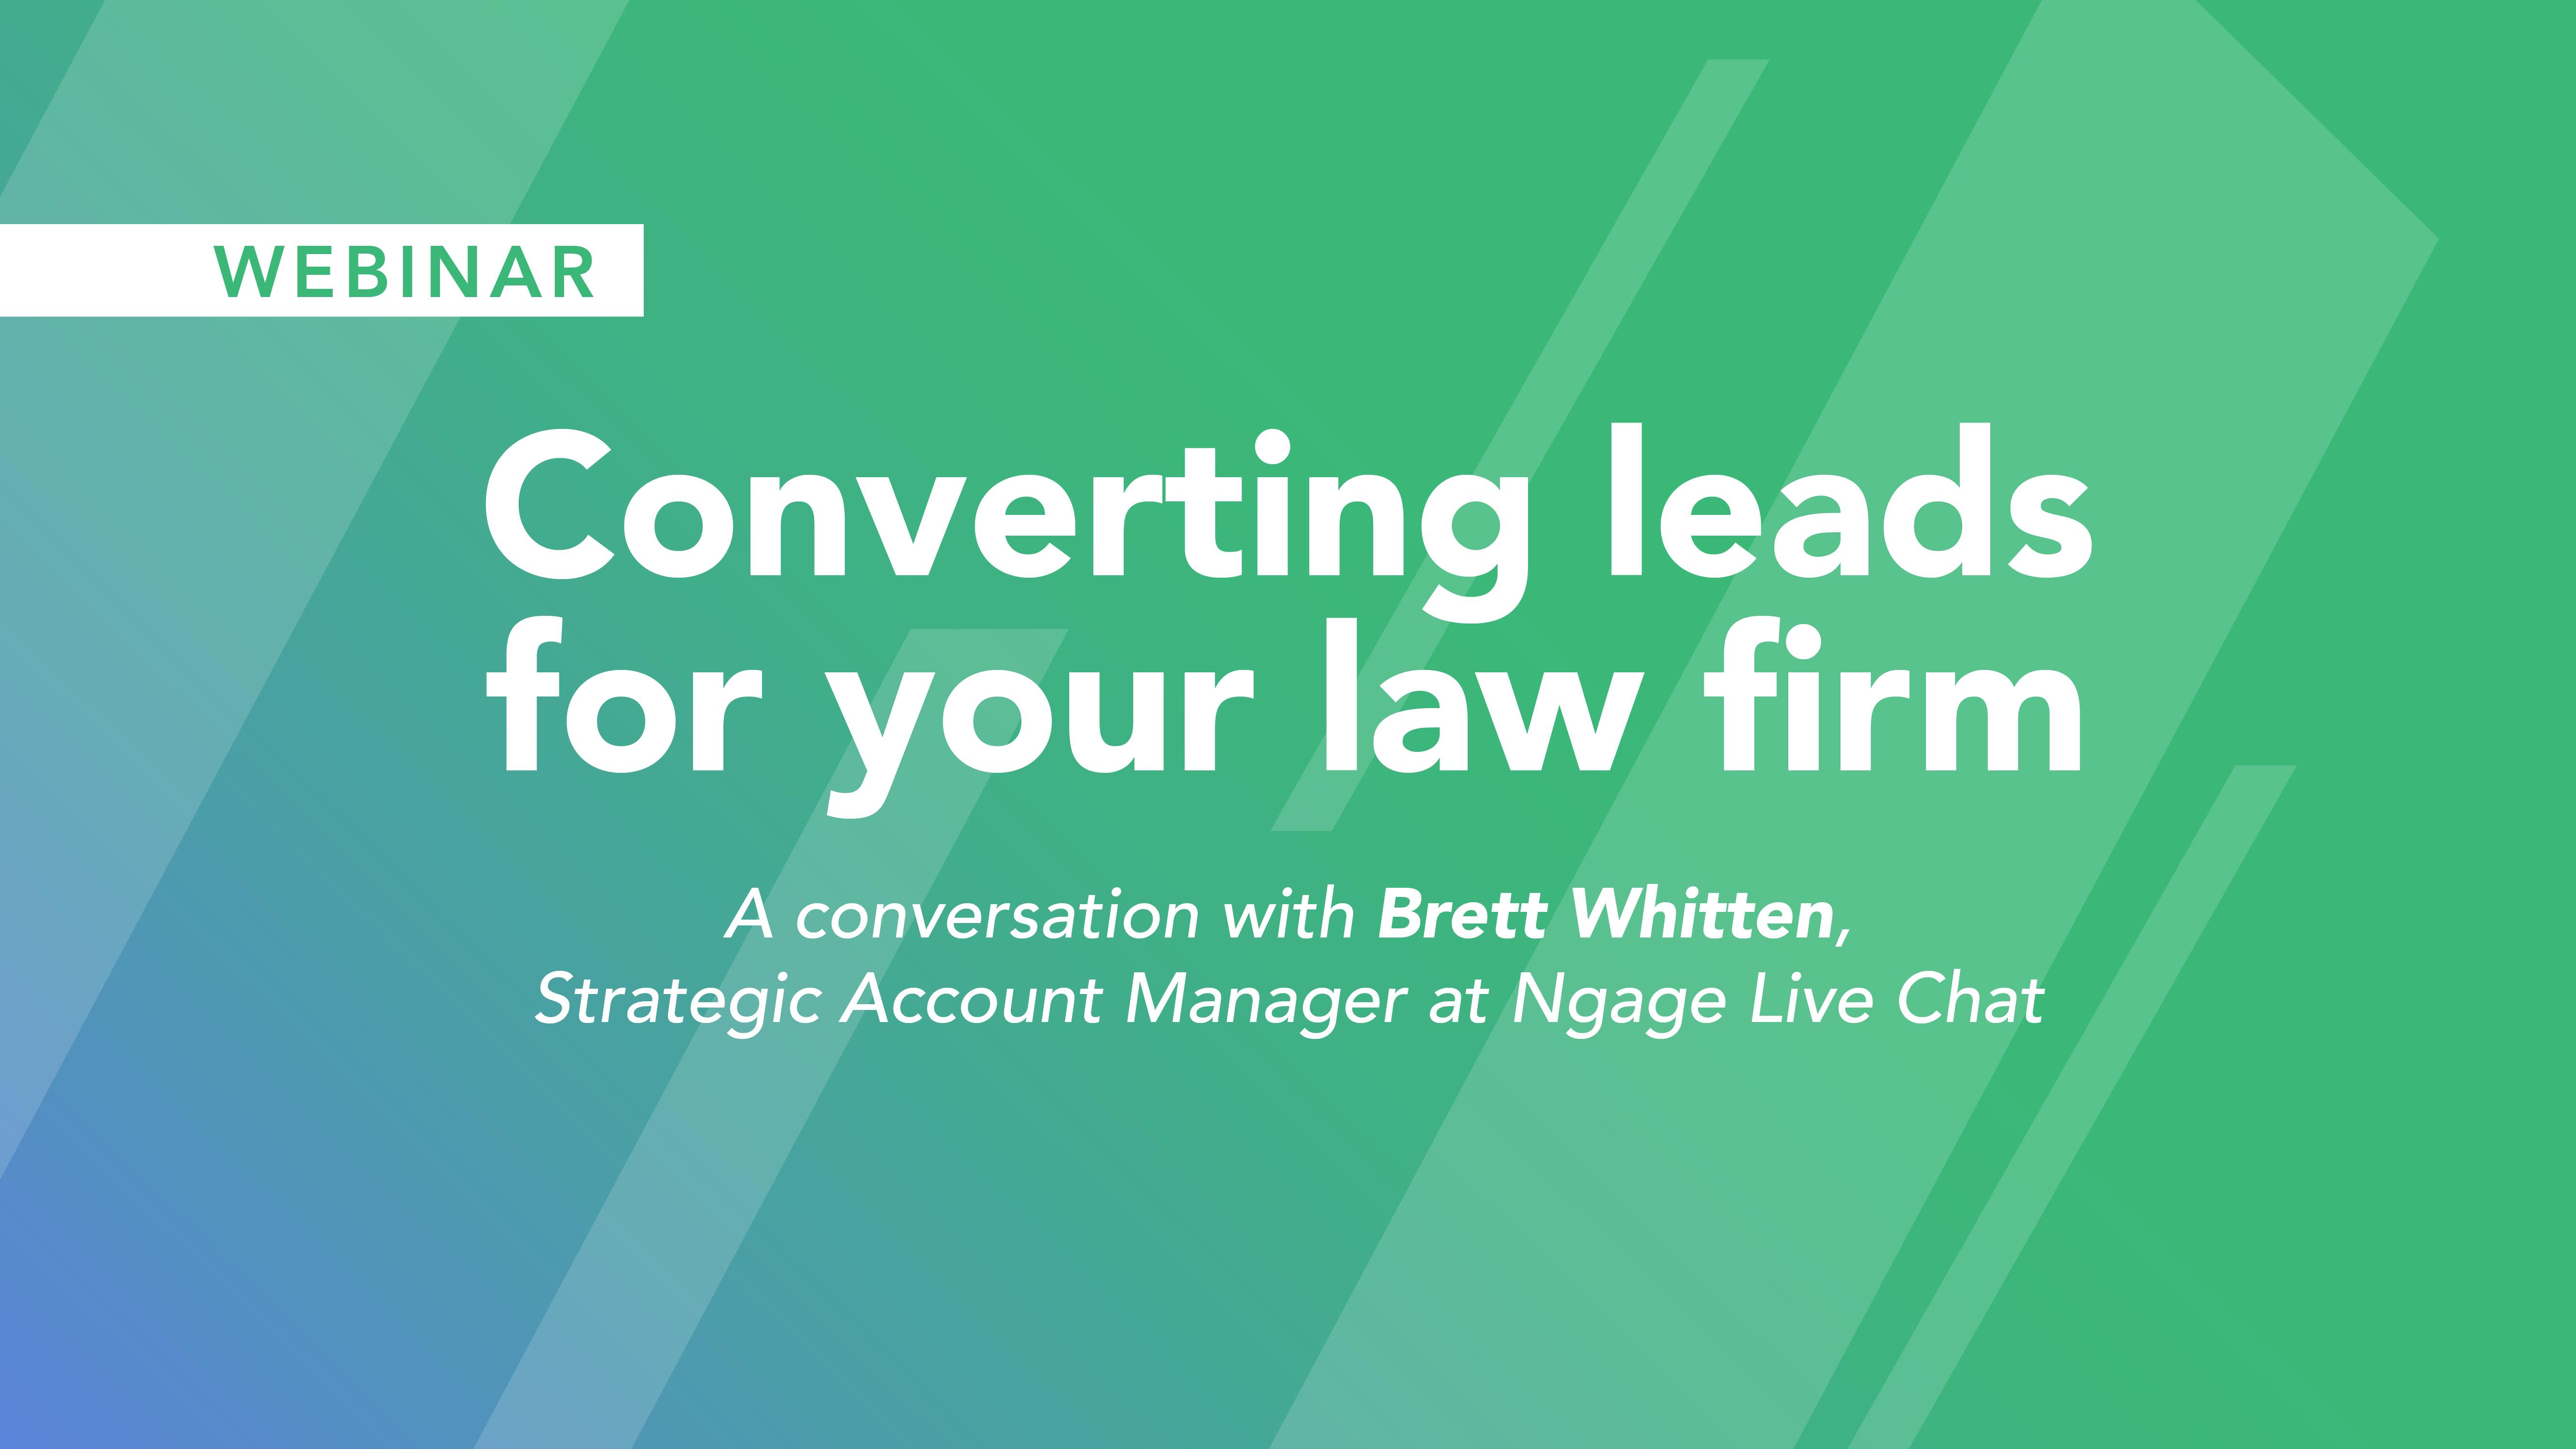 A Conversation with Brett Whitten